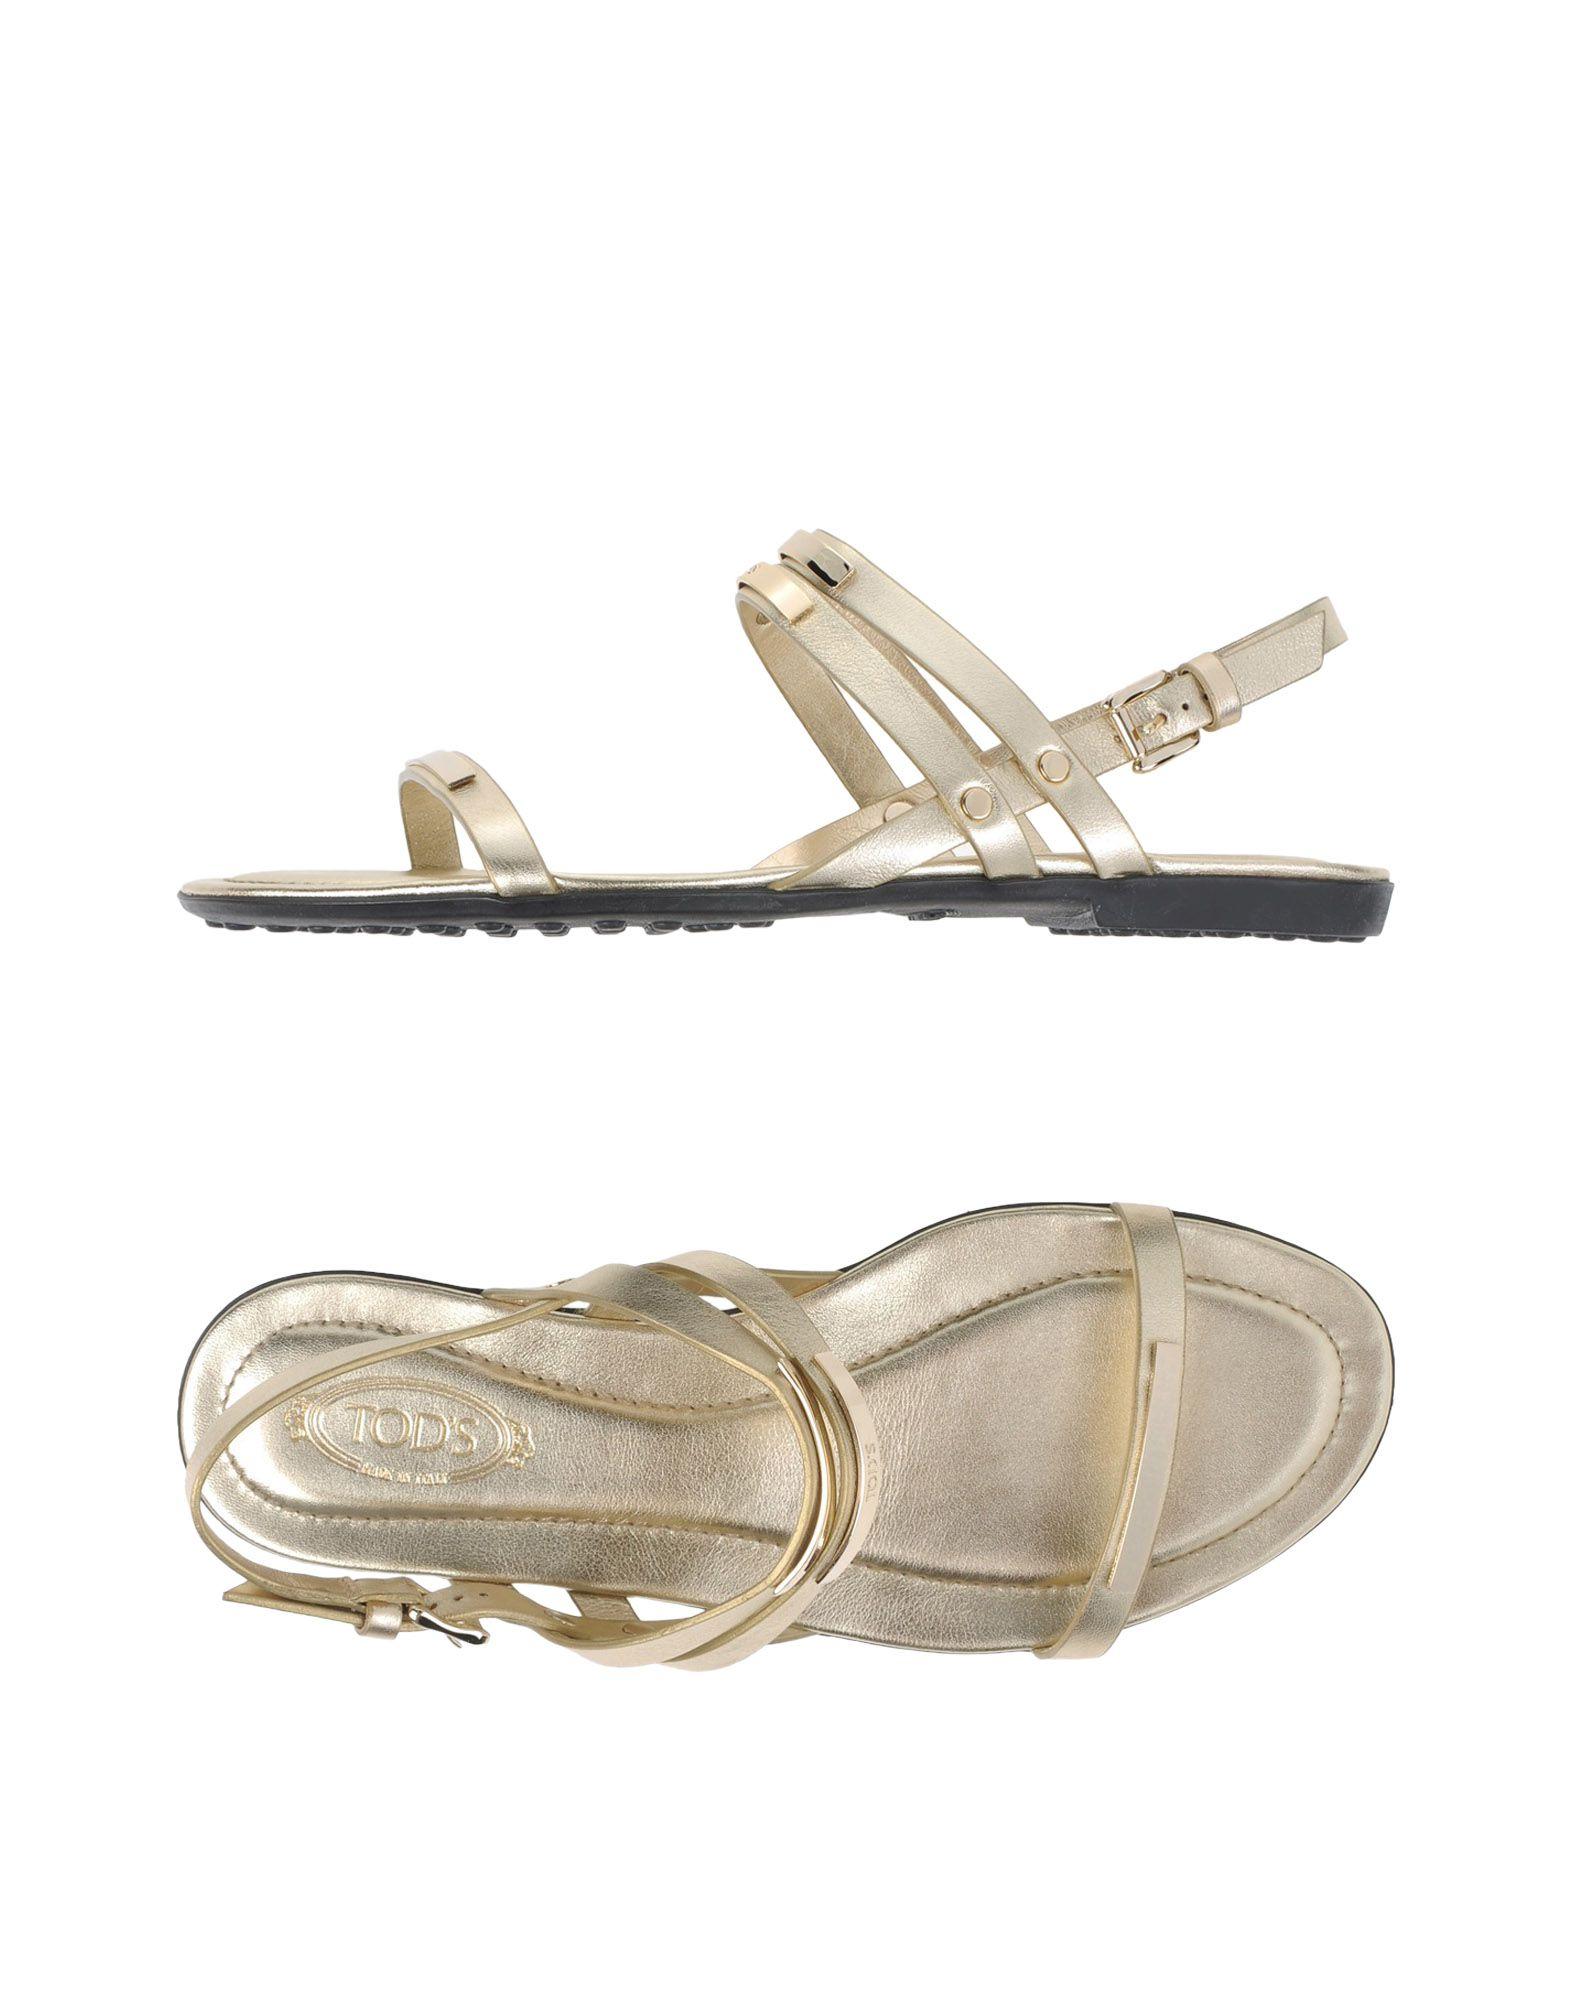 Chaussure compensée italienne